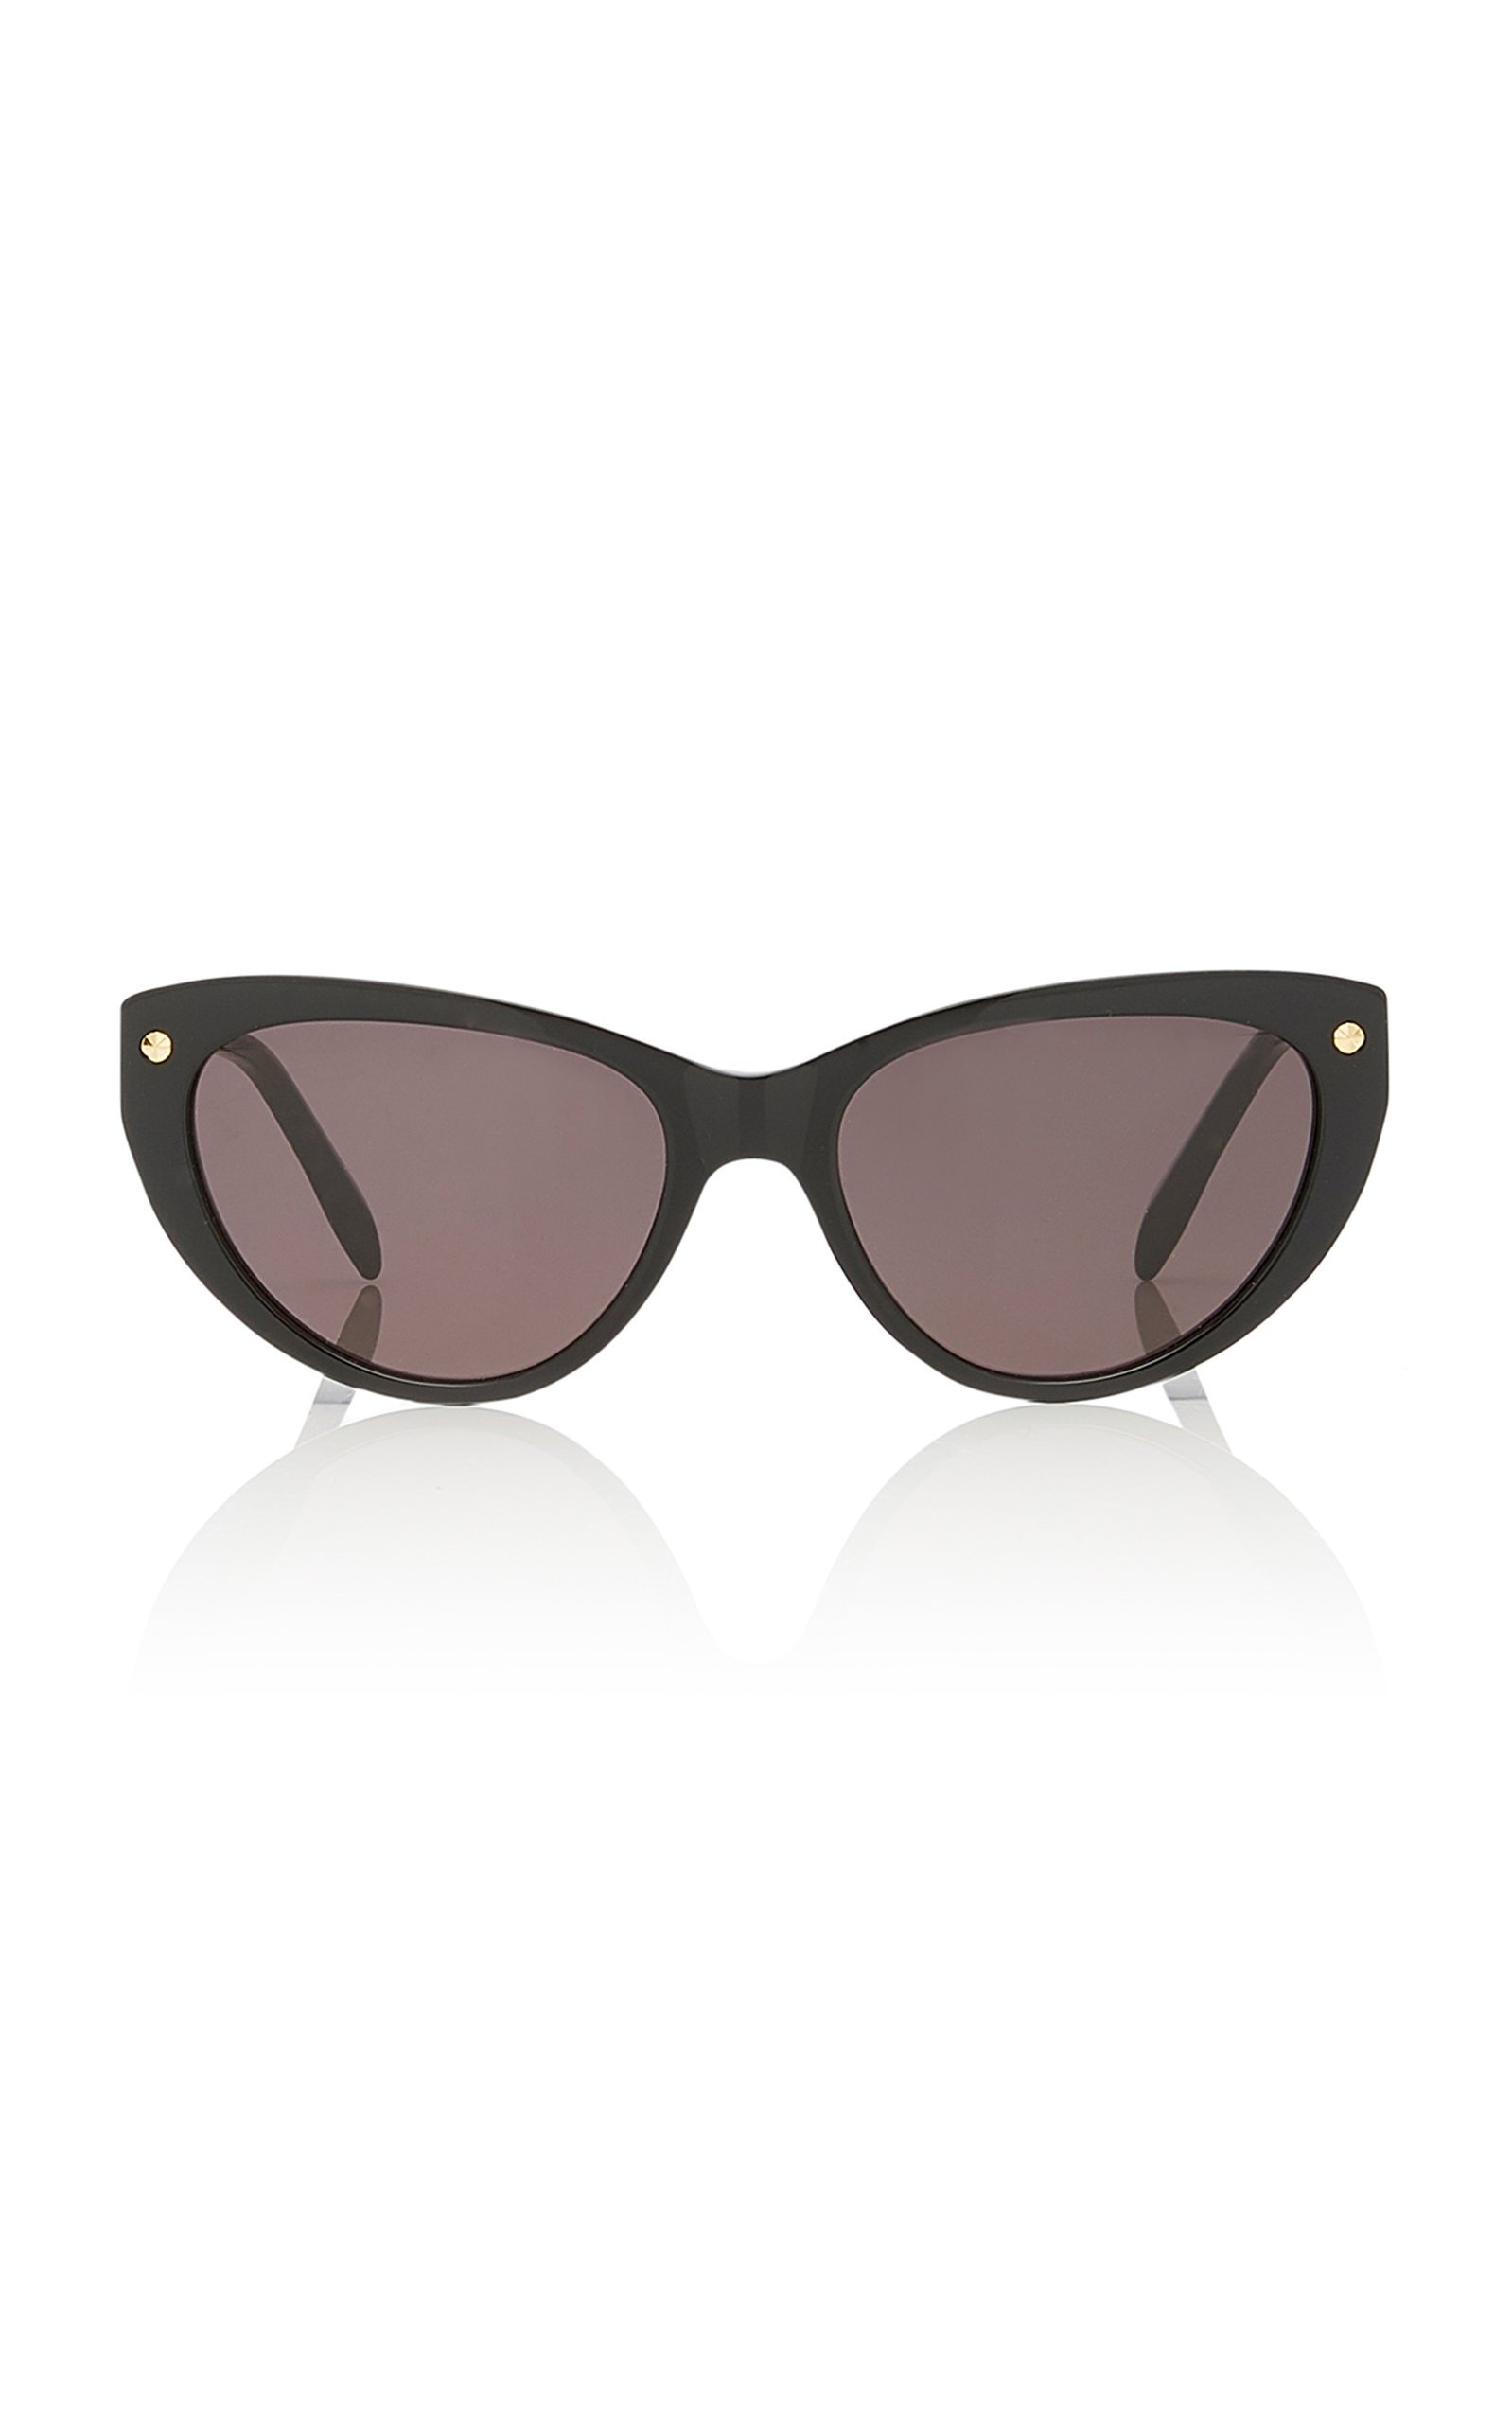 Alexander McQueen Sunglasses Cat-Eye Acetate Sunglasses